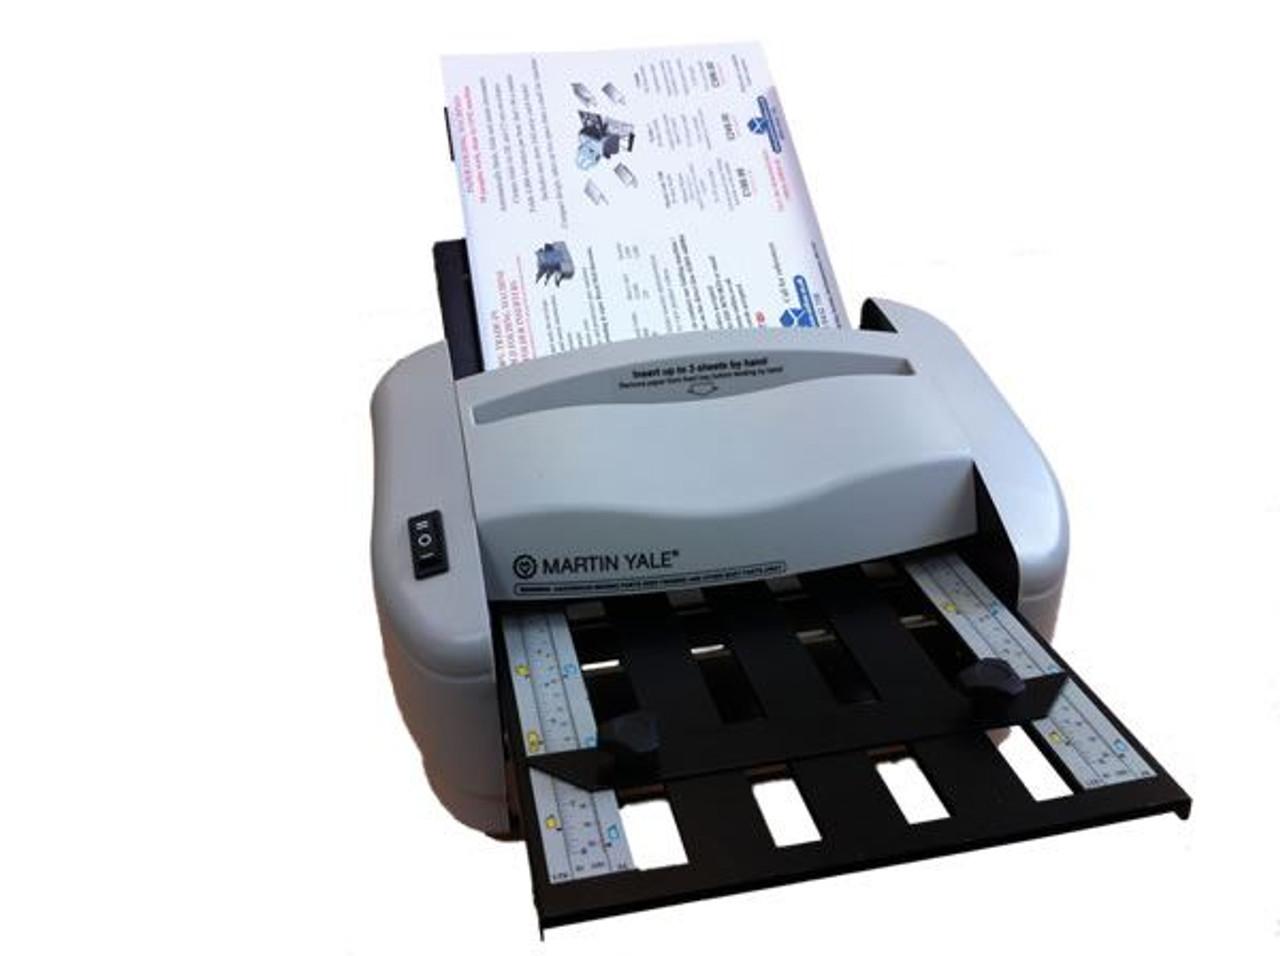 Martin Yale 7200 - A4 Paper Folding Machine with Catch Basket